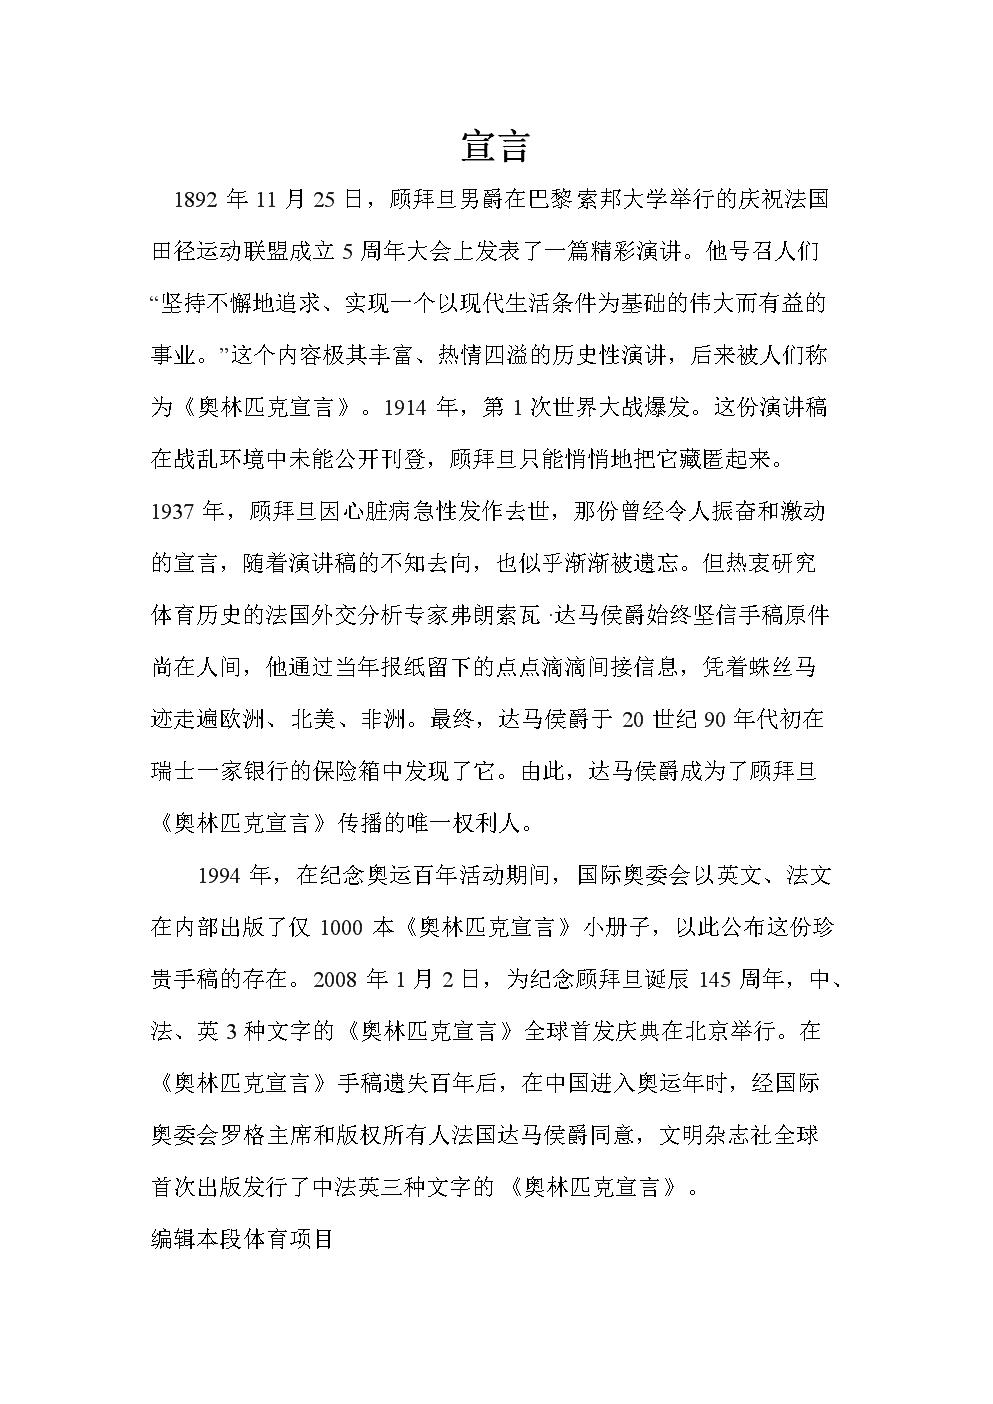 奥林匹克知识1.doc